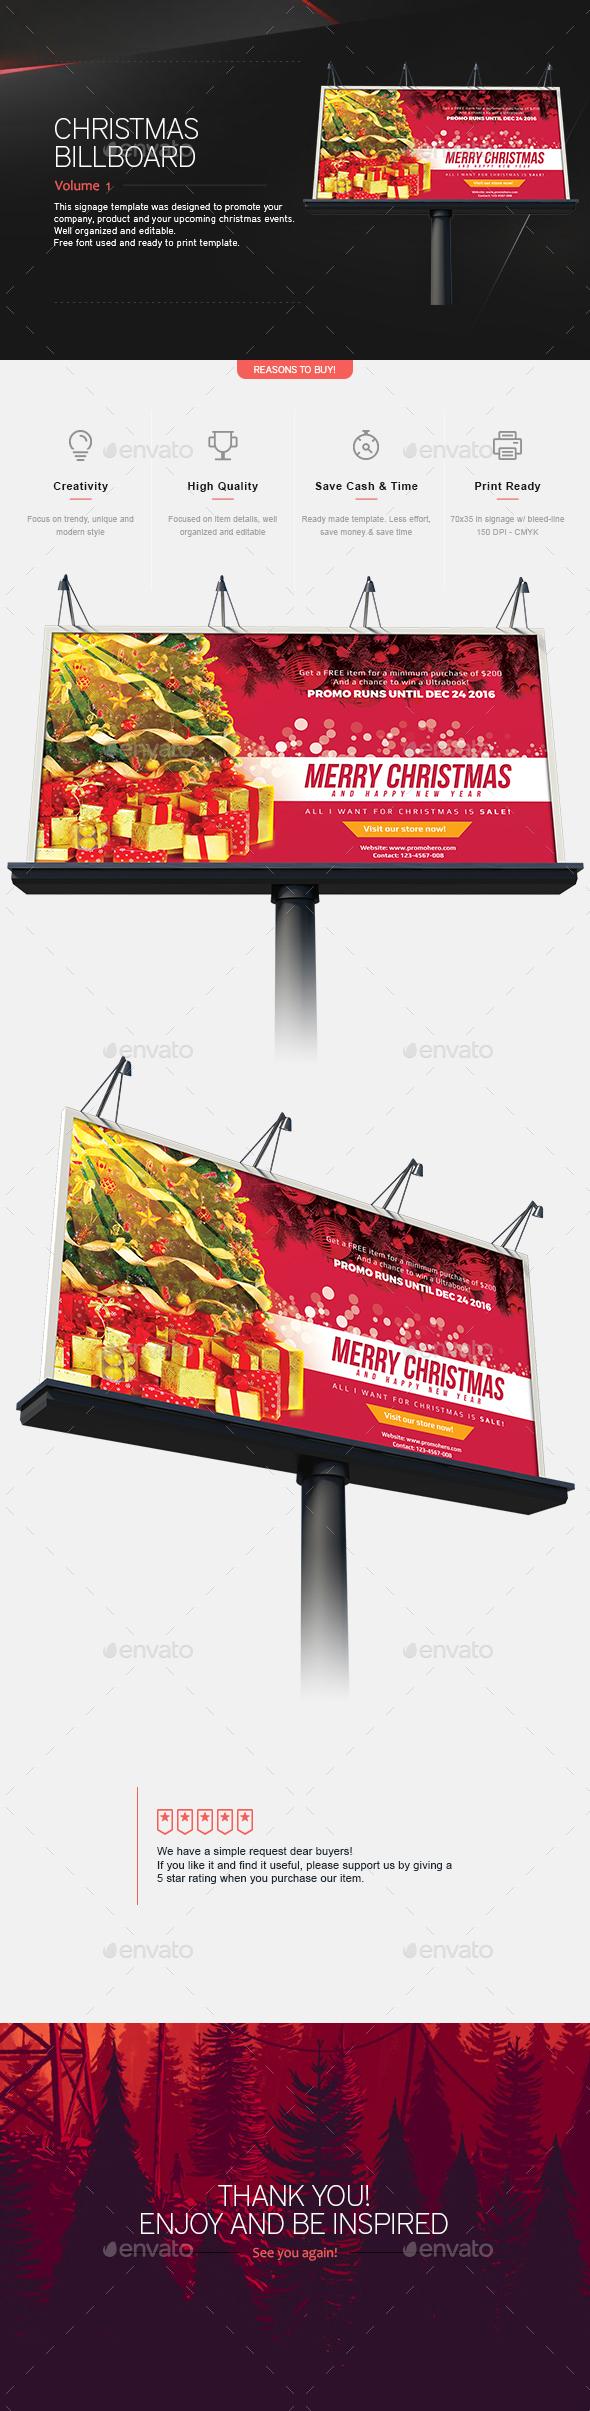 Christmas Signage & Billboard V.1 - Signage Print Templates